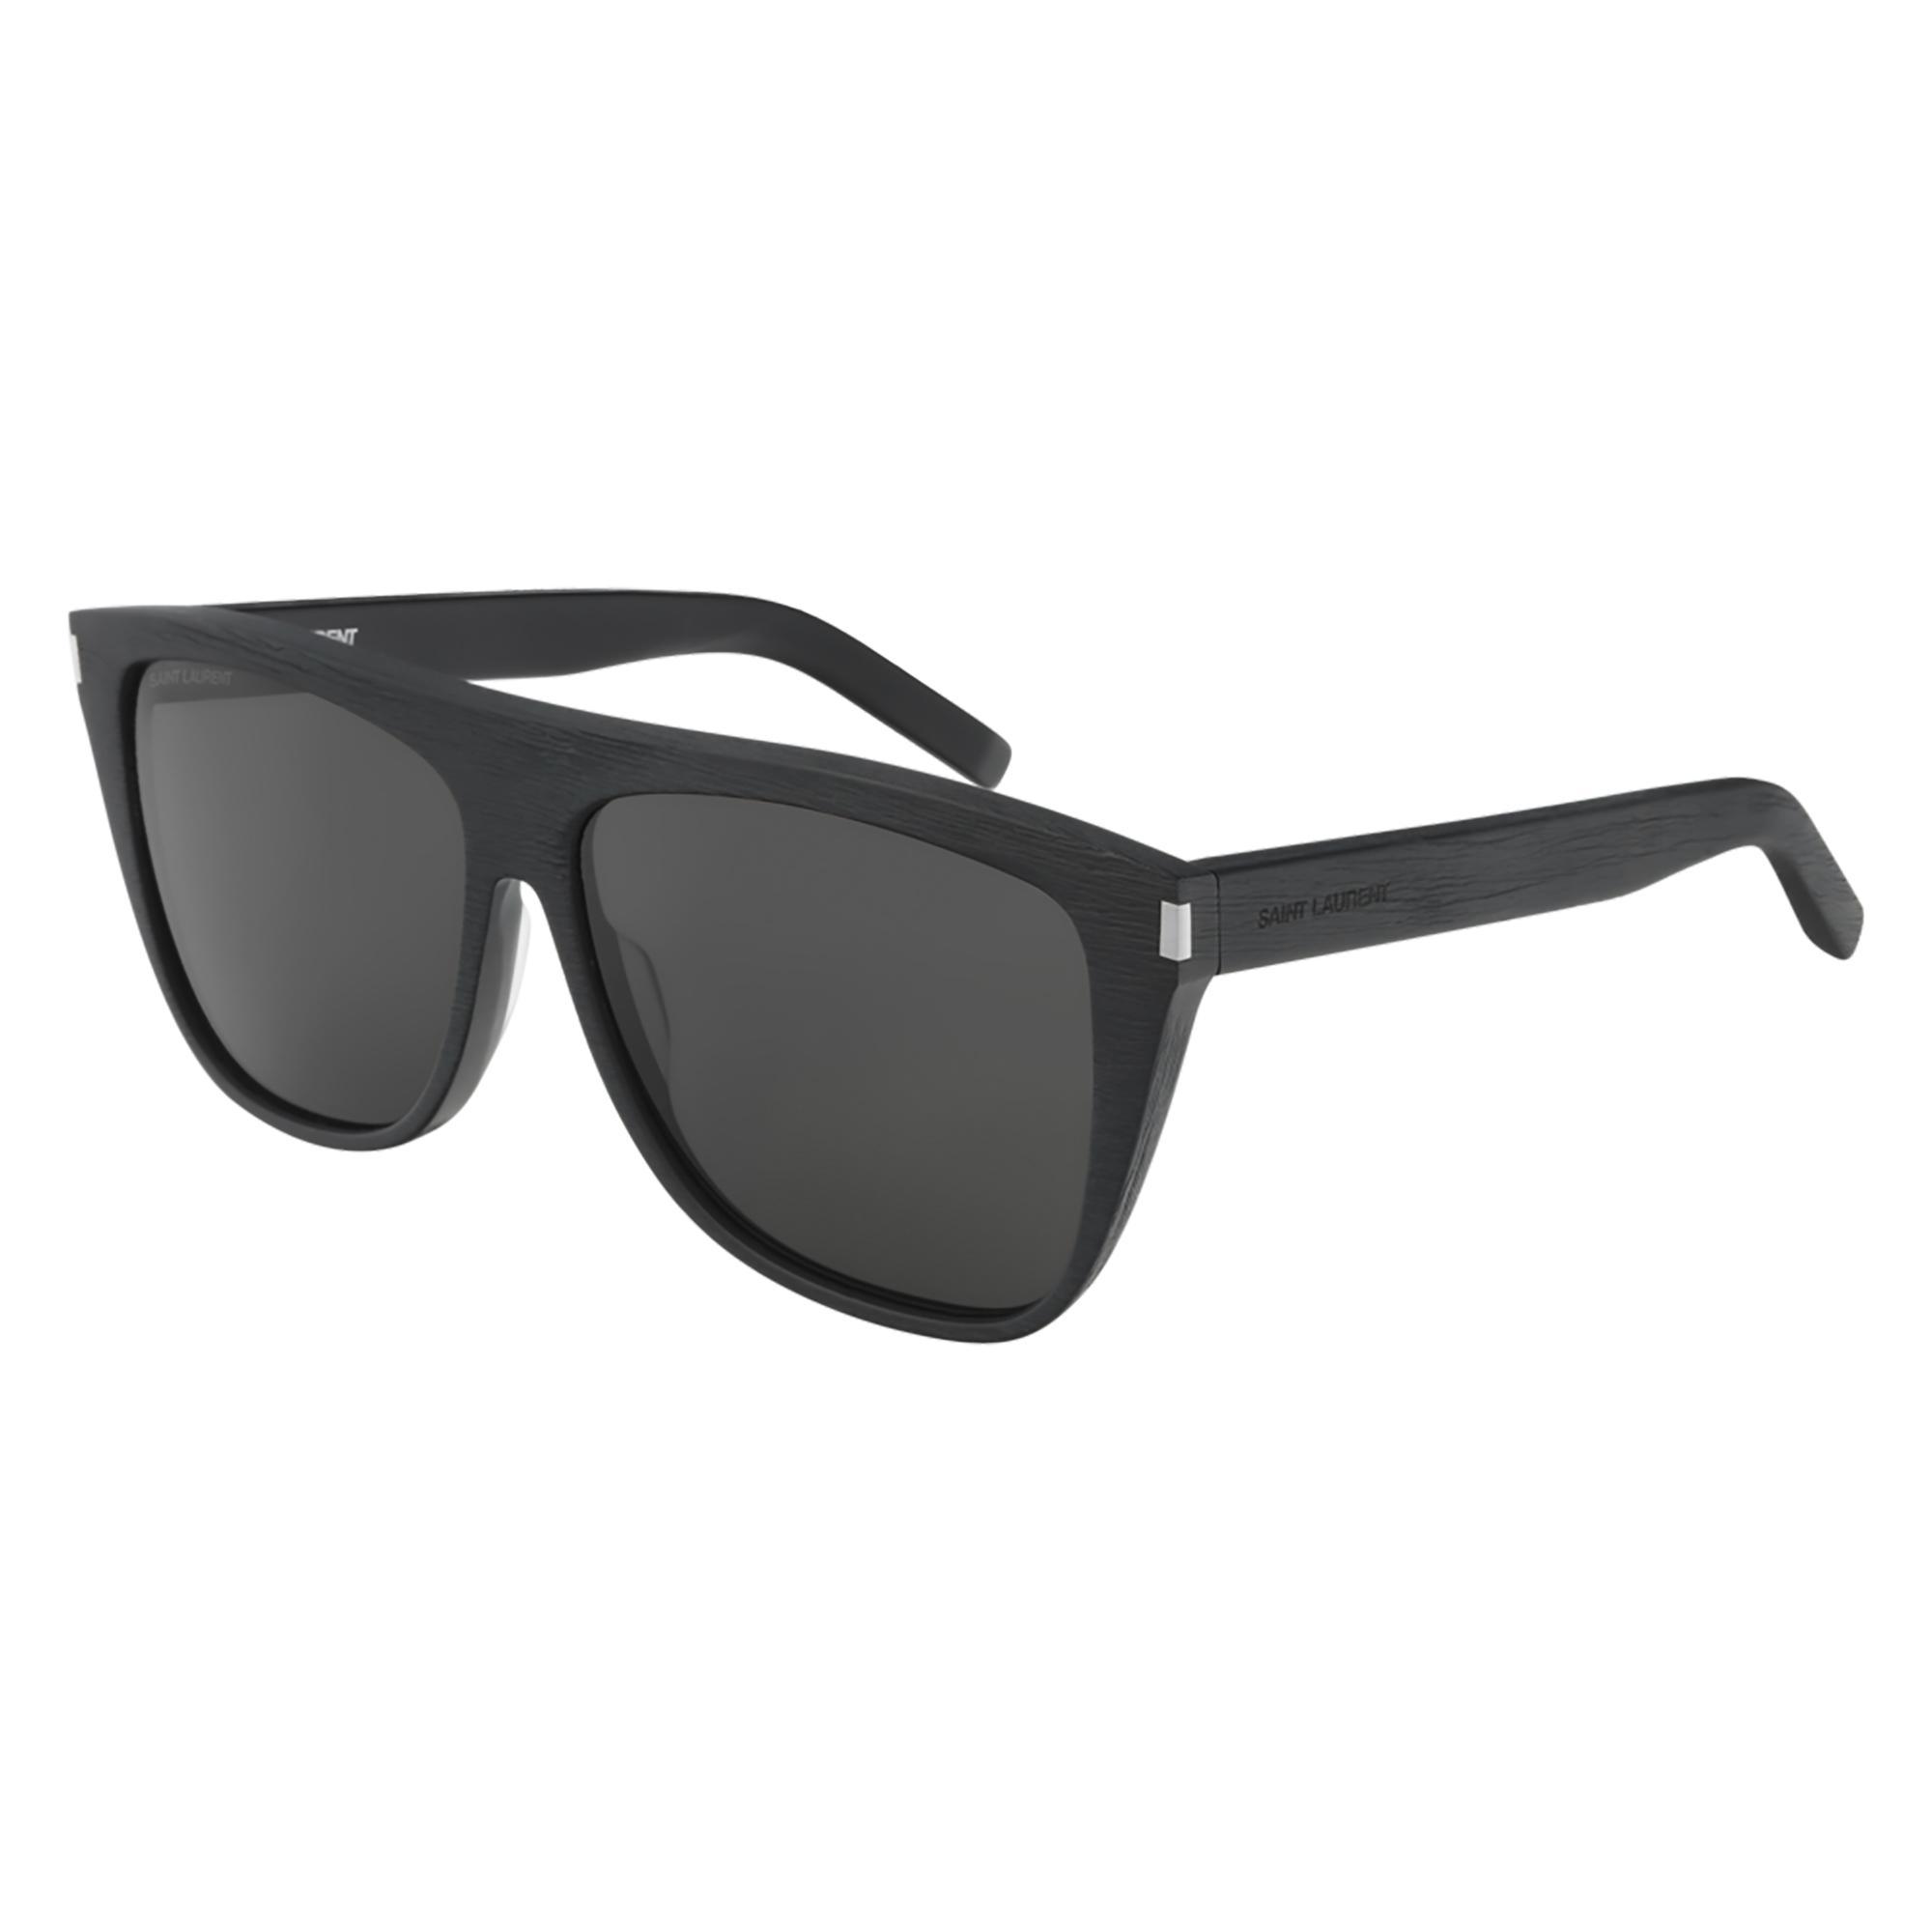 017 black black grey